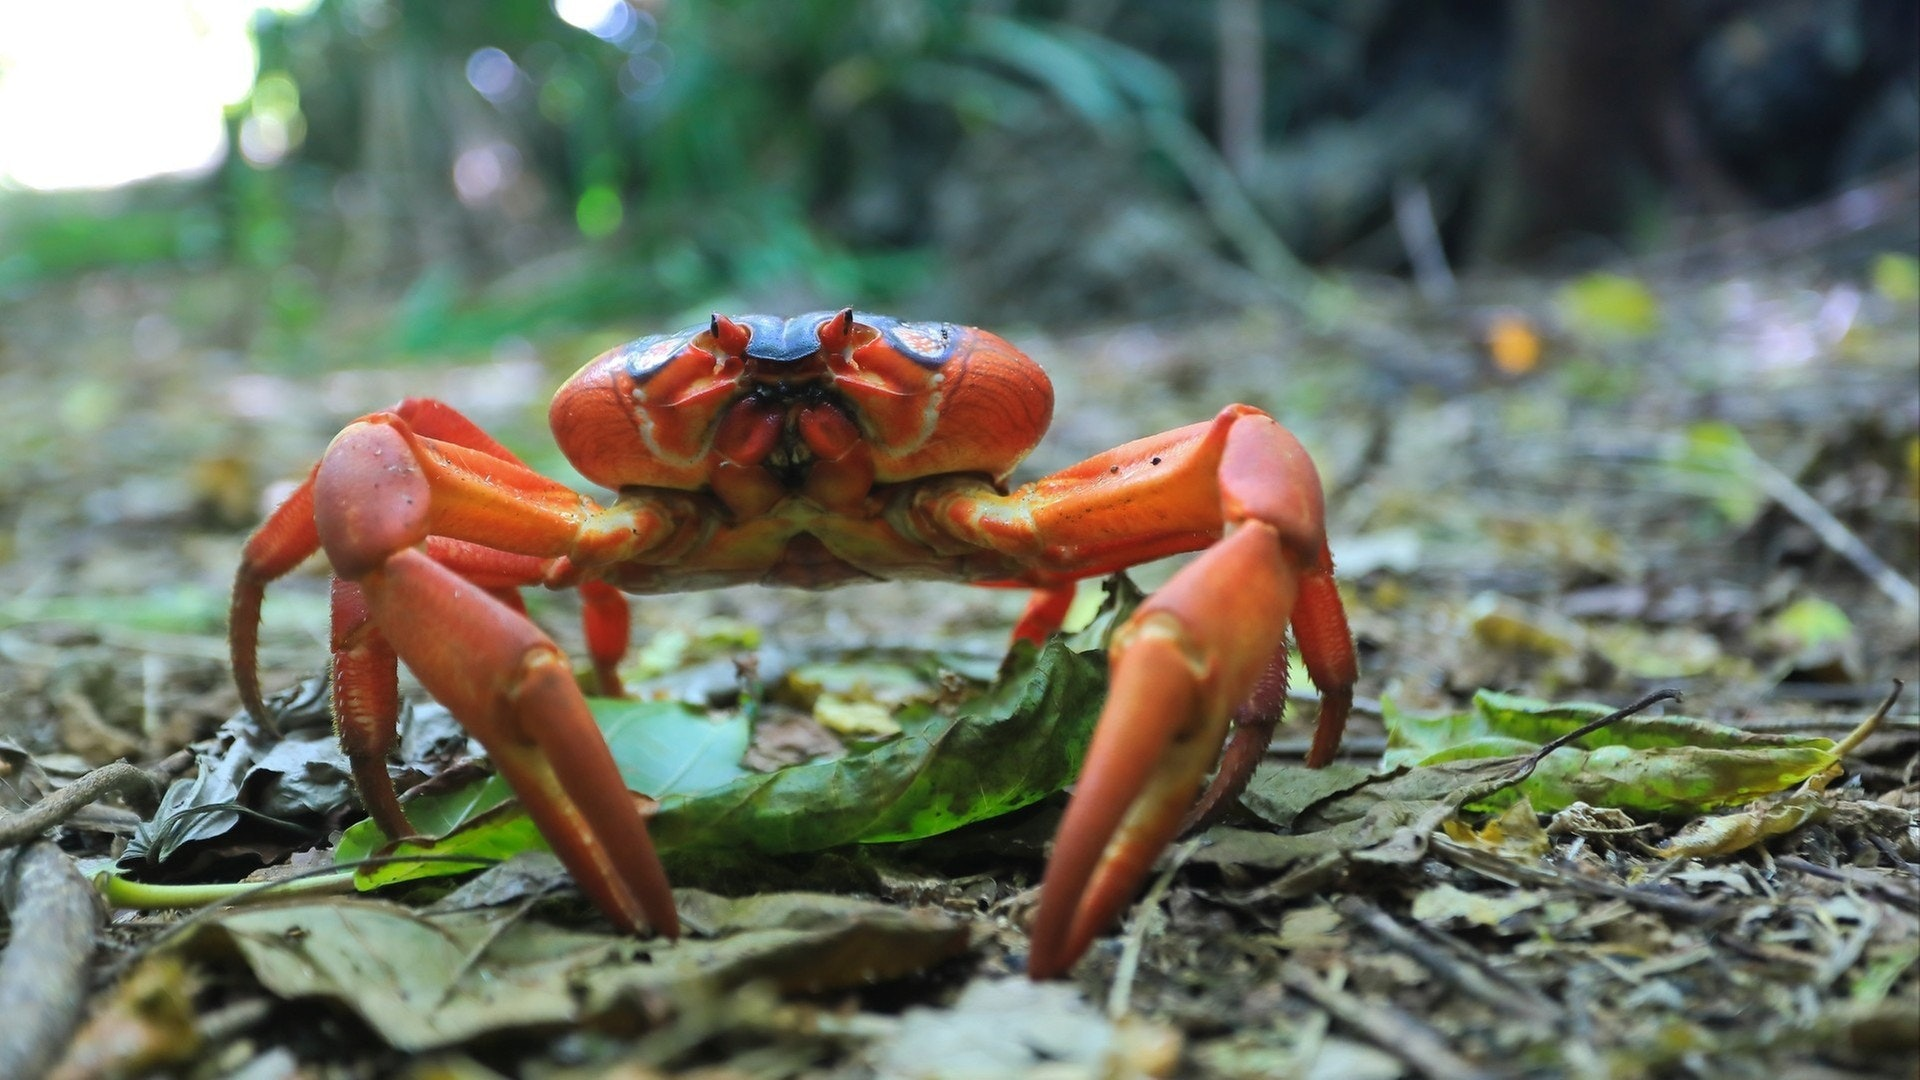 A single red crab on Christmas Island, an Australian territory